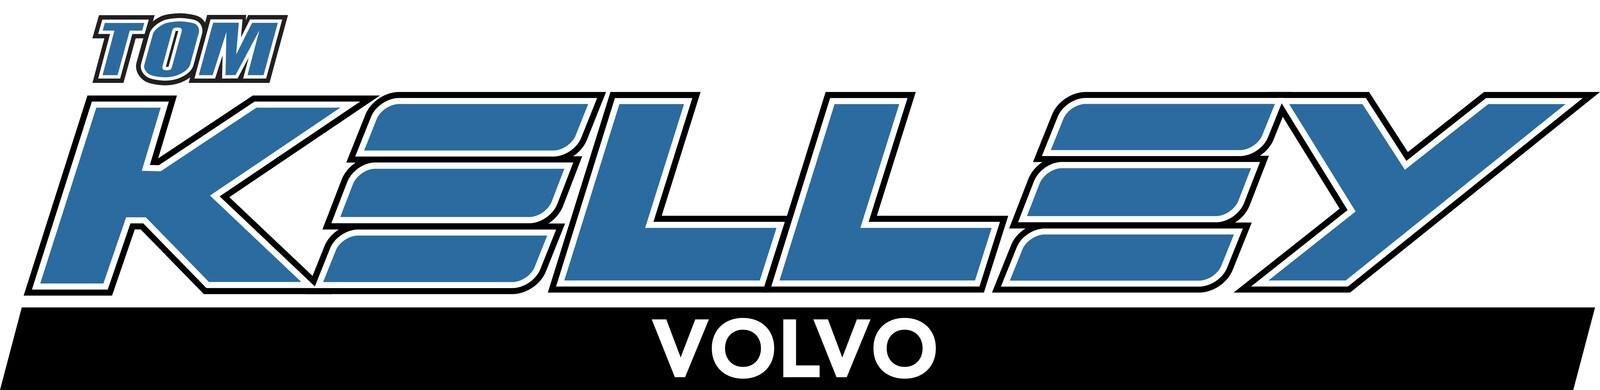 Kelley Chevrolet Fort Wayne >> Tom Kelley Volvo Cars New Used Volvo Dealership Ft